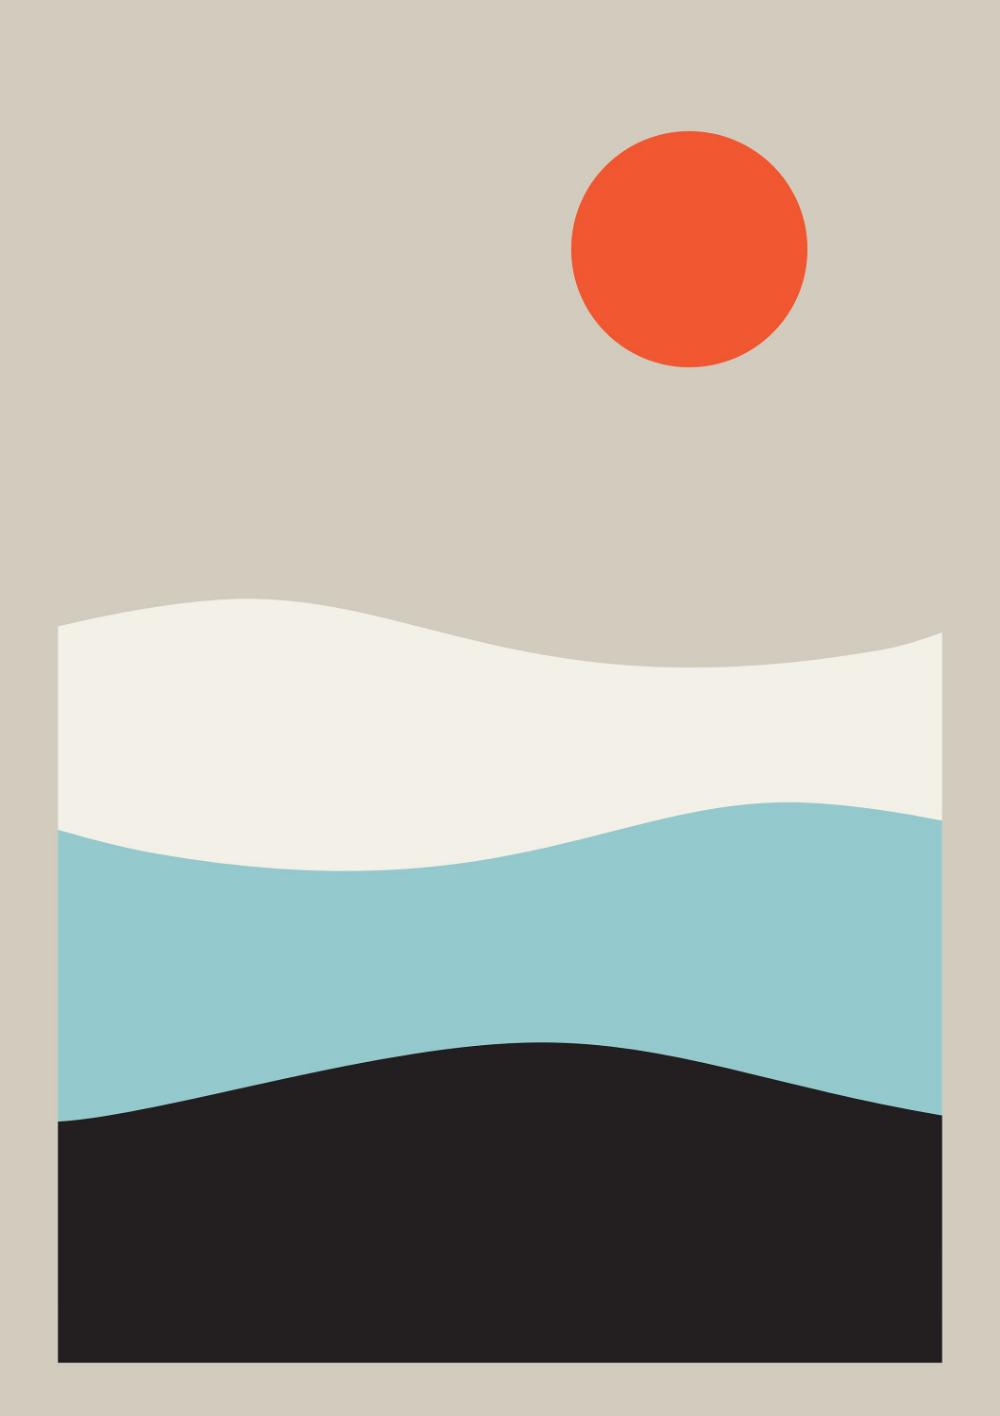 Sunset Art Print Sunrise Geometric Landscape Sea Prints Printed Poster Ocean Print Large Poster Nursery Decor 24x36 24 X 36 Art With Images Sunset Art Ocean Print Poster Prints